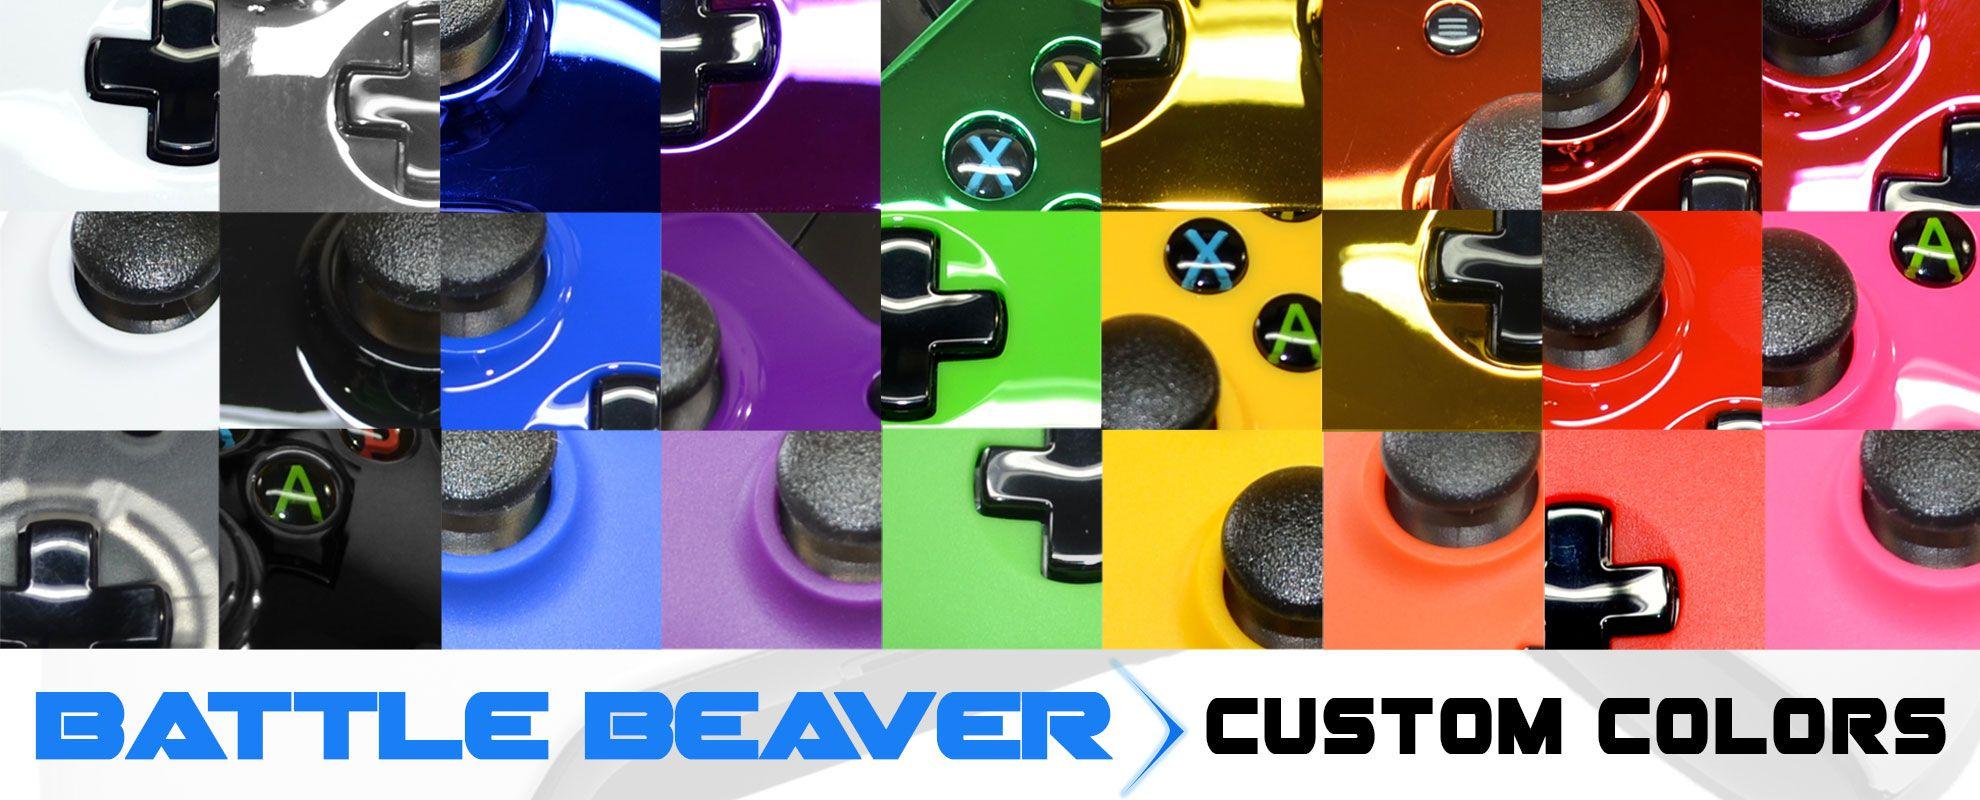 Battle Beaver Customs Increase Your Gaming Potential